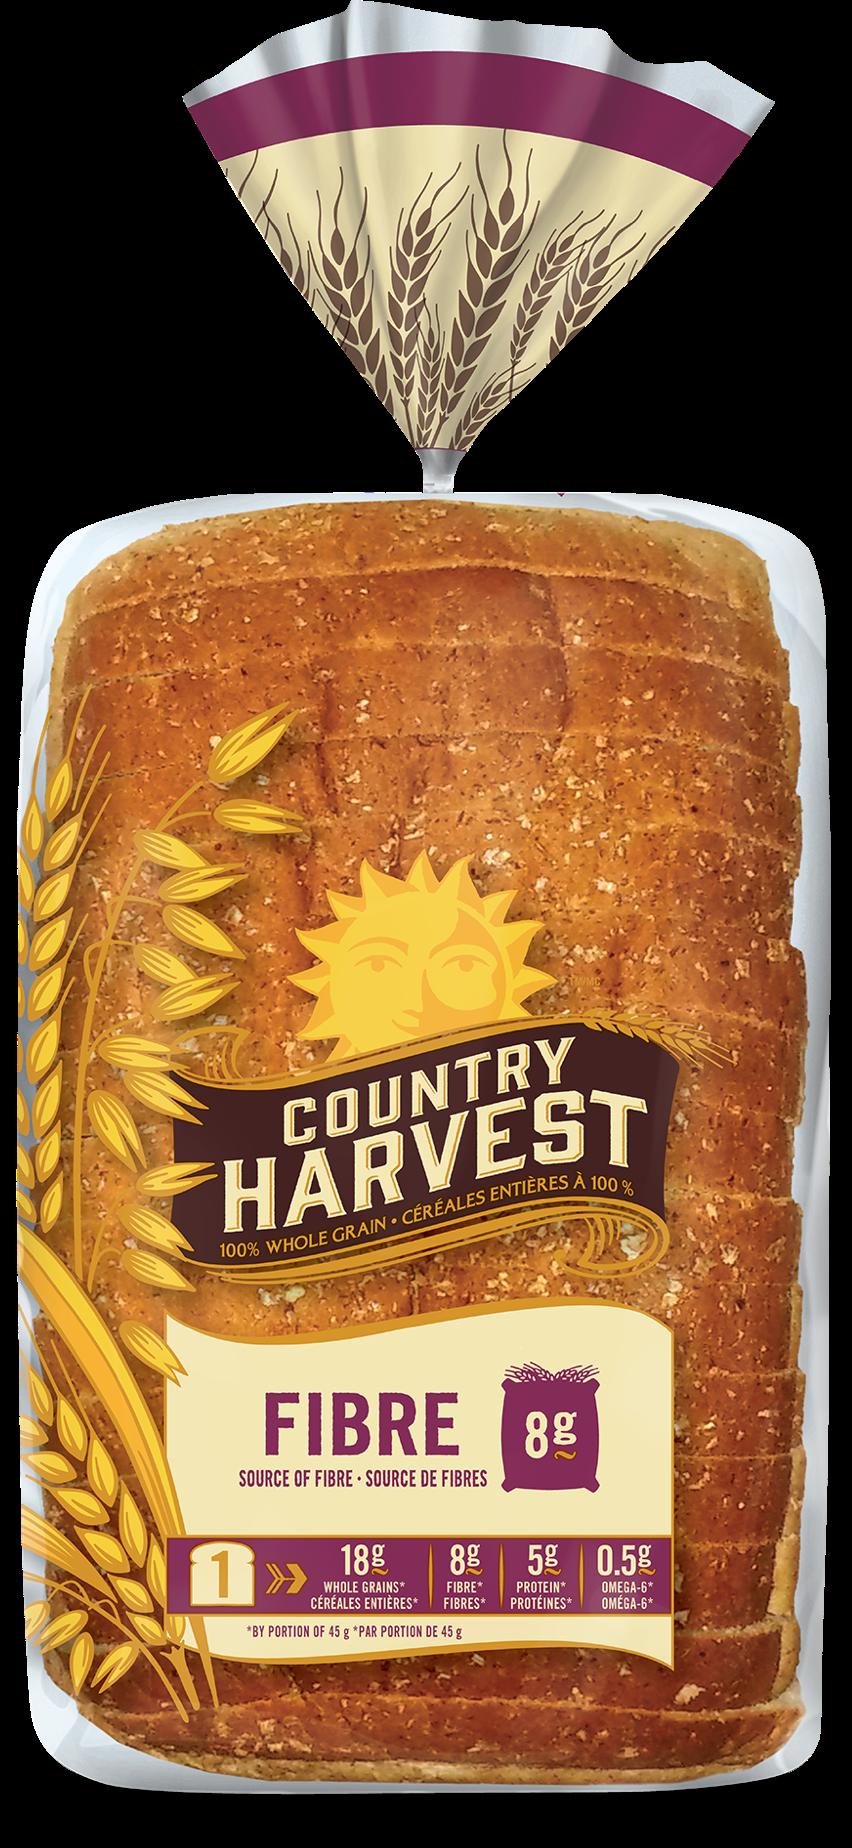 Grain clipart fiber. Fibre country harvest chfibredfacehr